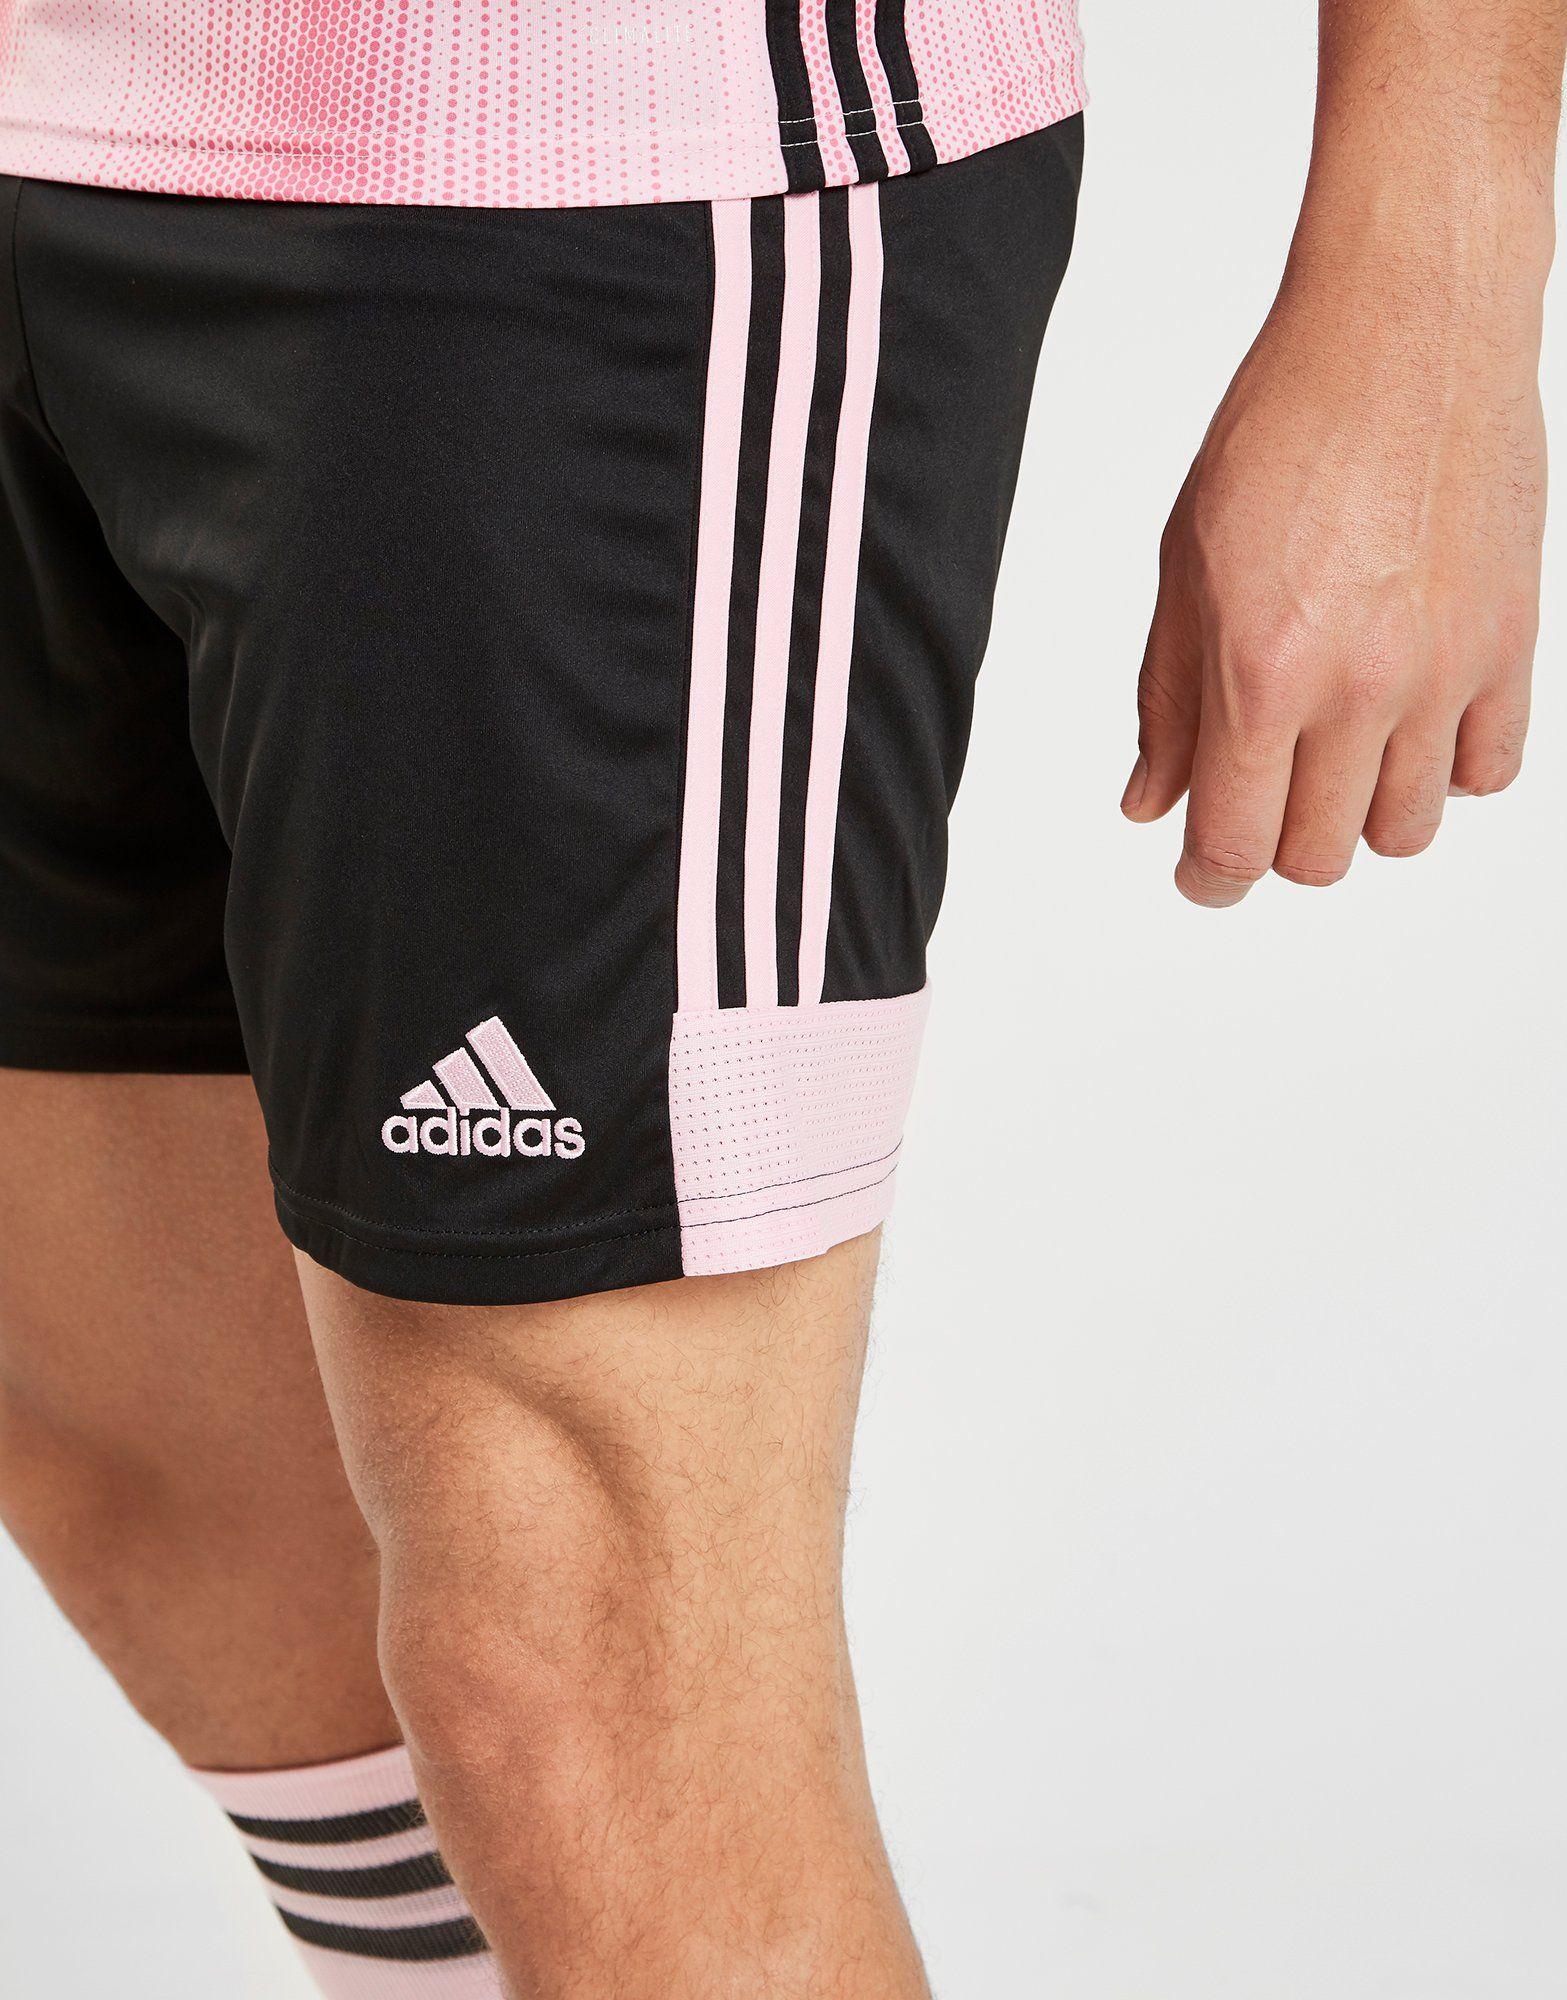 adidas Scotland WWC 2019 Away Shorts PRE ORDER